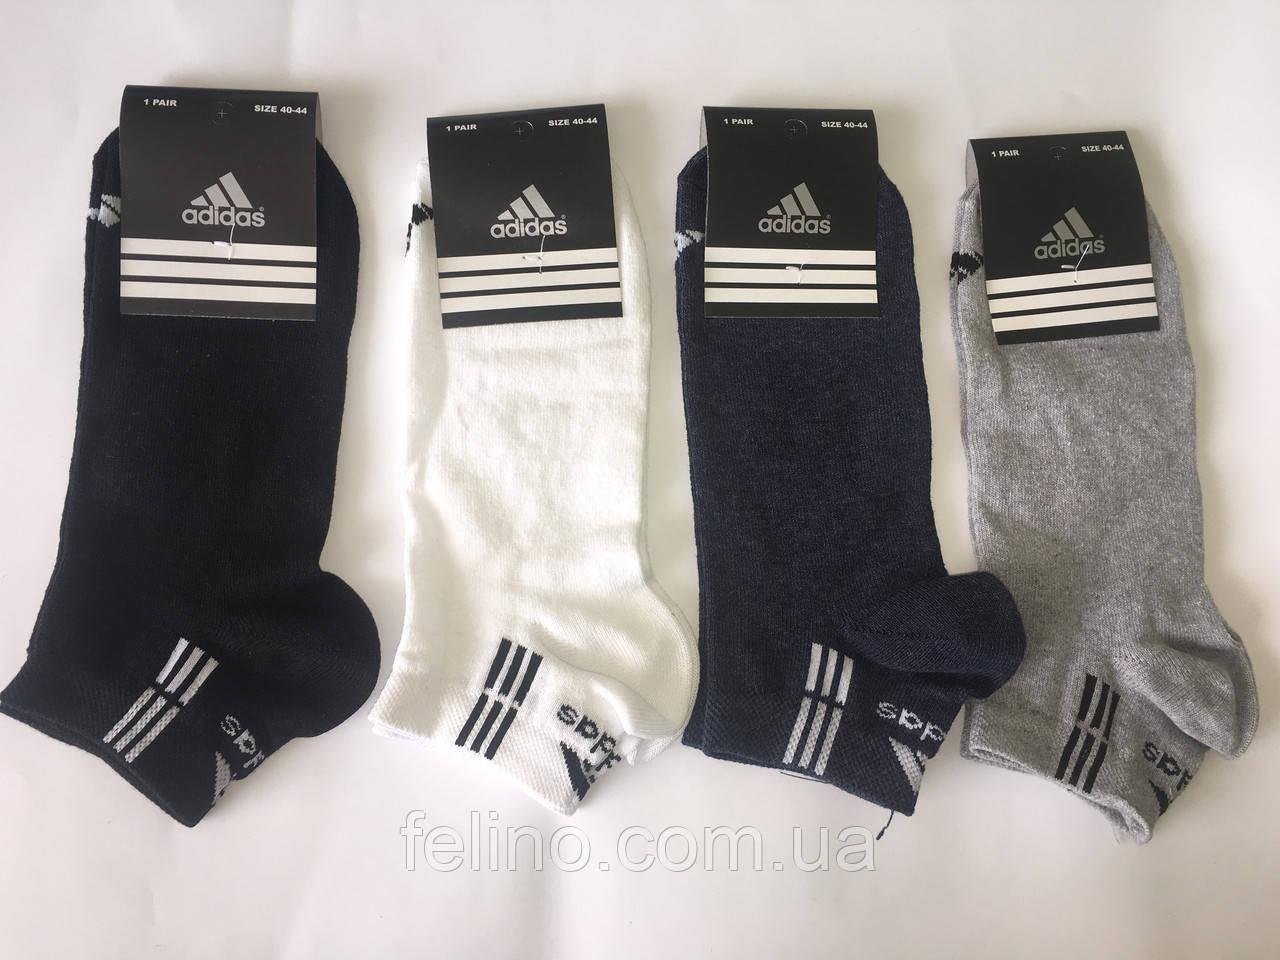 1615f908e778 Носки короткие спорт Adidas 40-44р.: продажа, цена в Хмельницком.  спортивные носки, ...